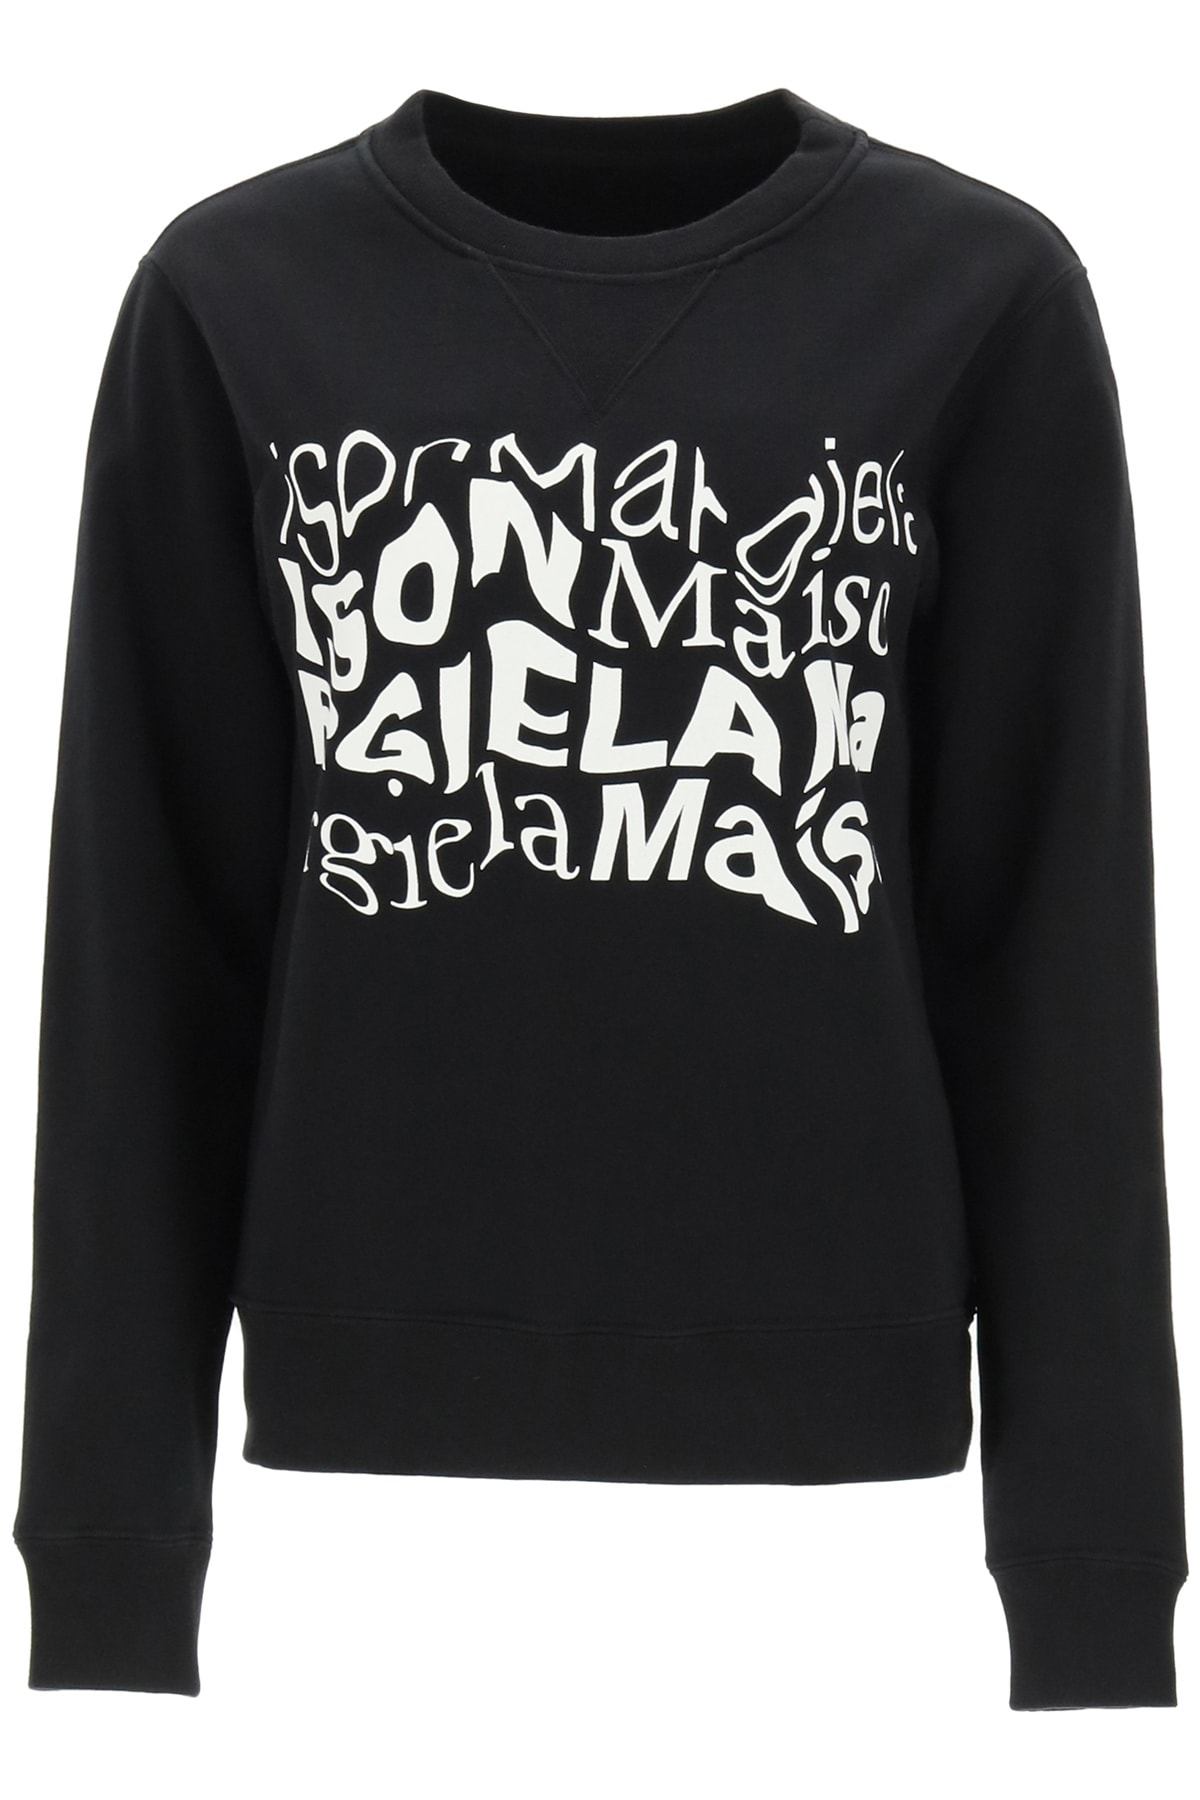 Maison Margiela Sweatshirt With Distorted Logo